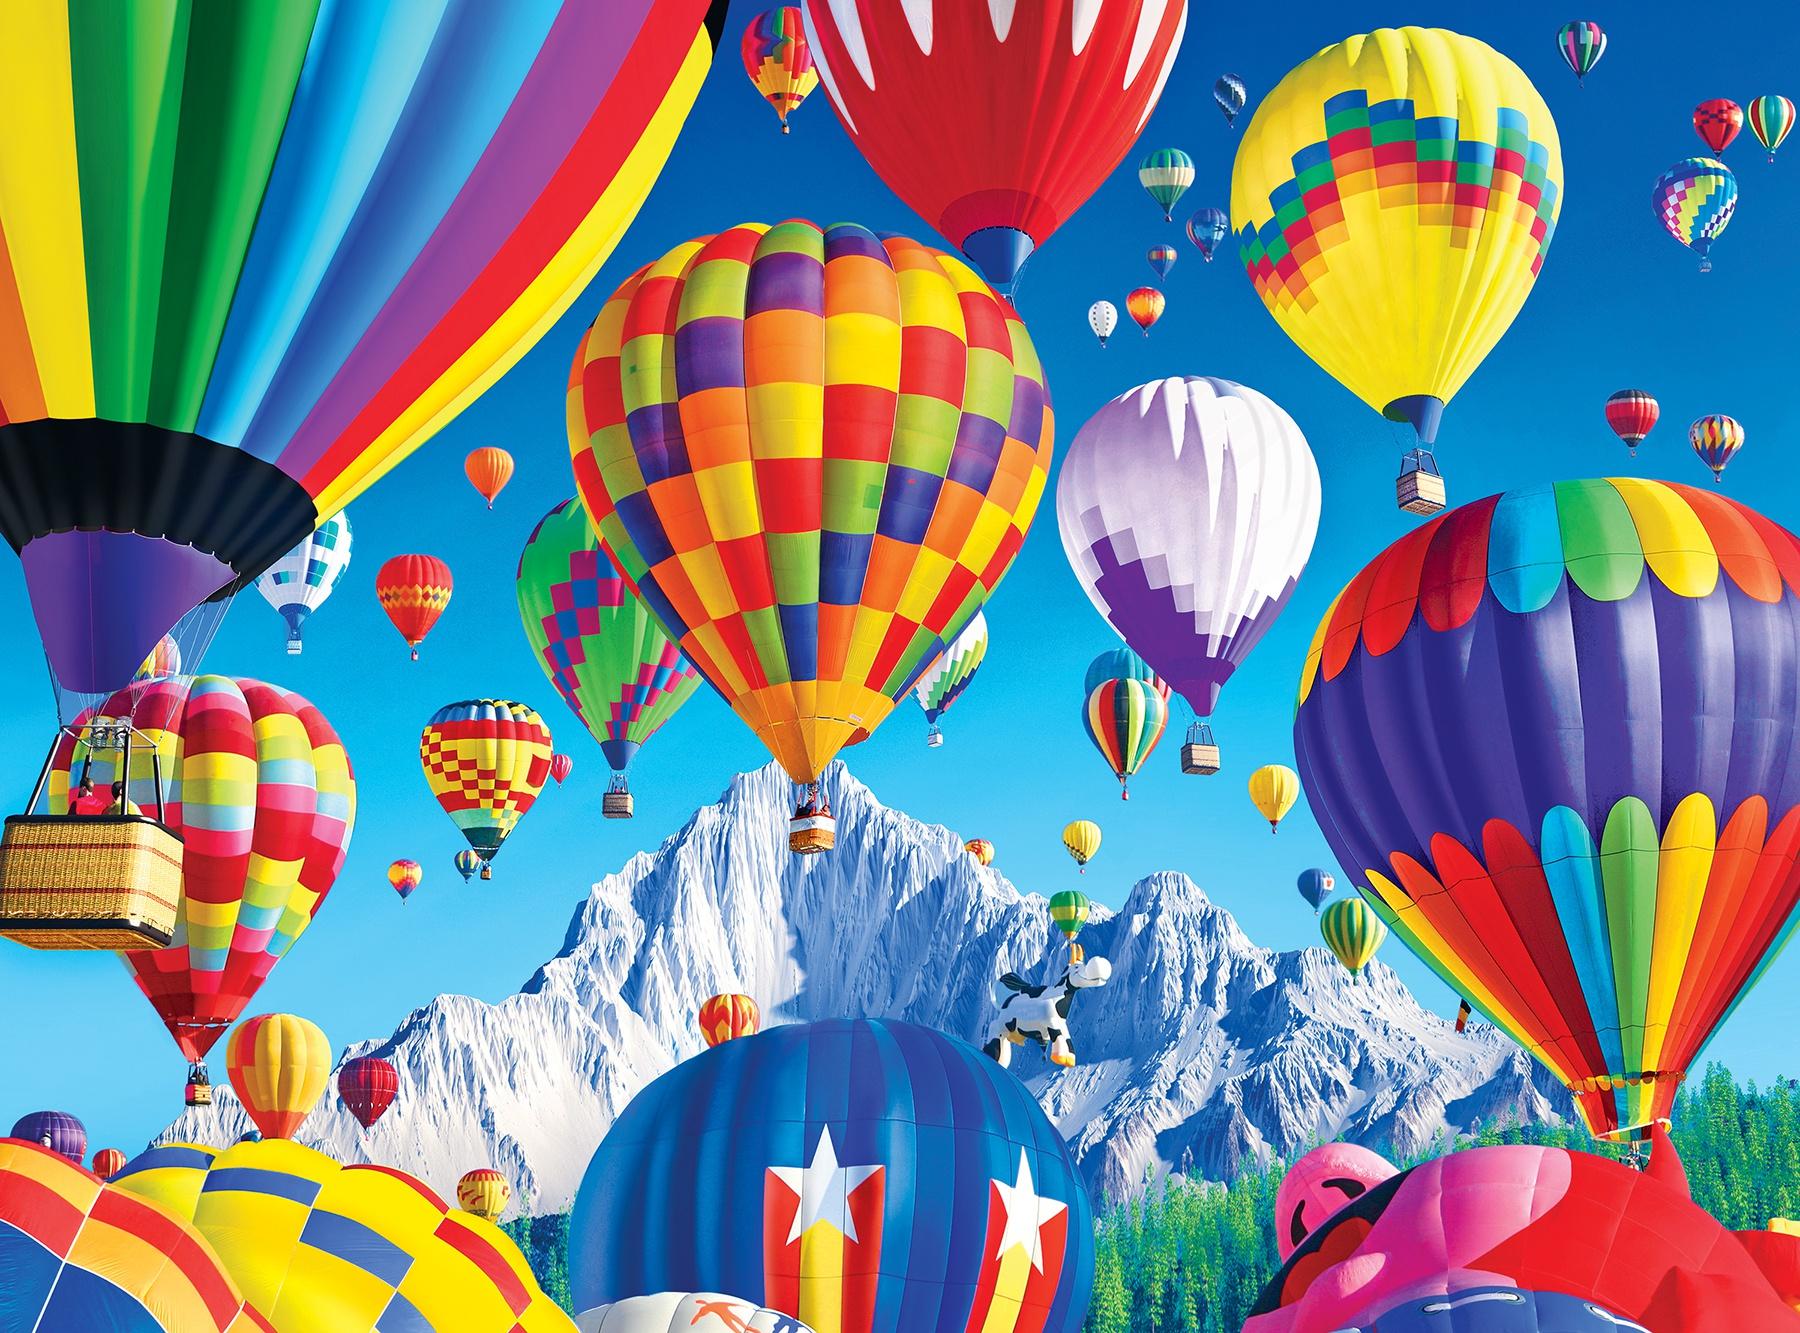 Premium Jigsaw Puzzle 1000 Pieces 20X27-Balloons Over A Mountain